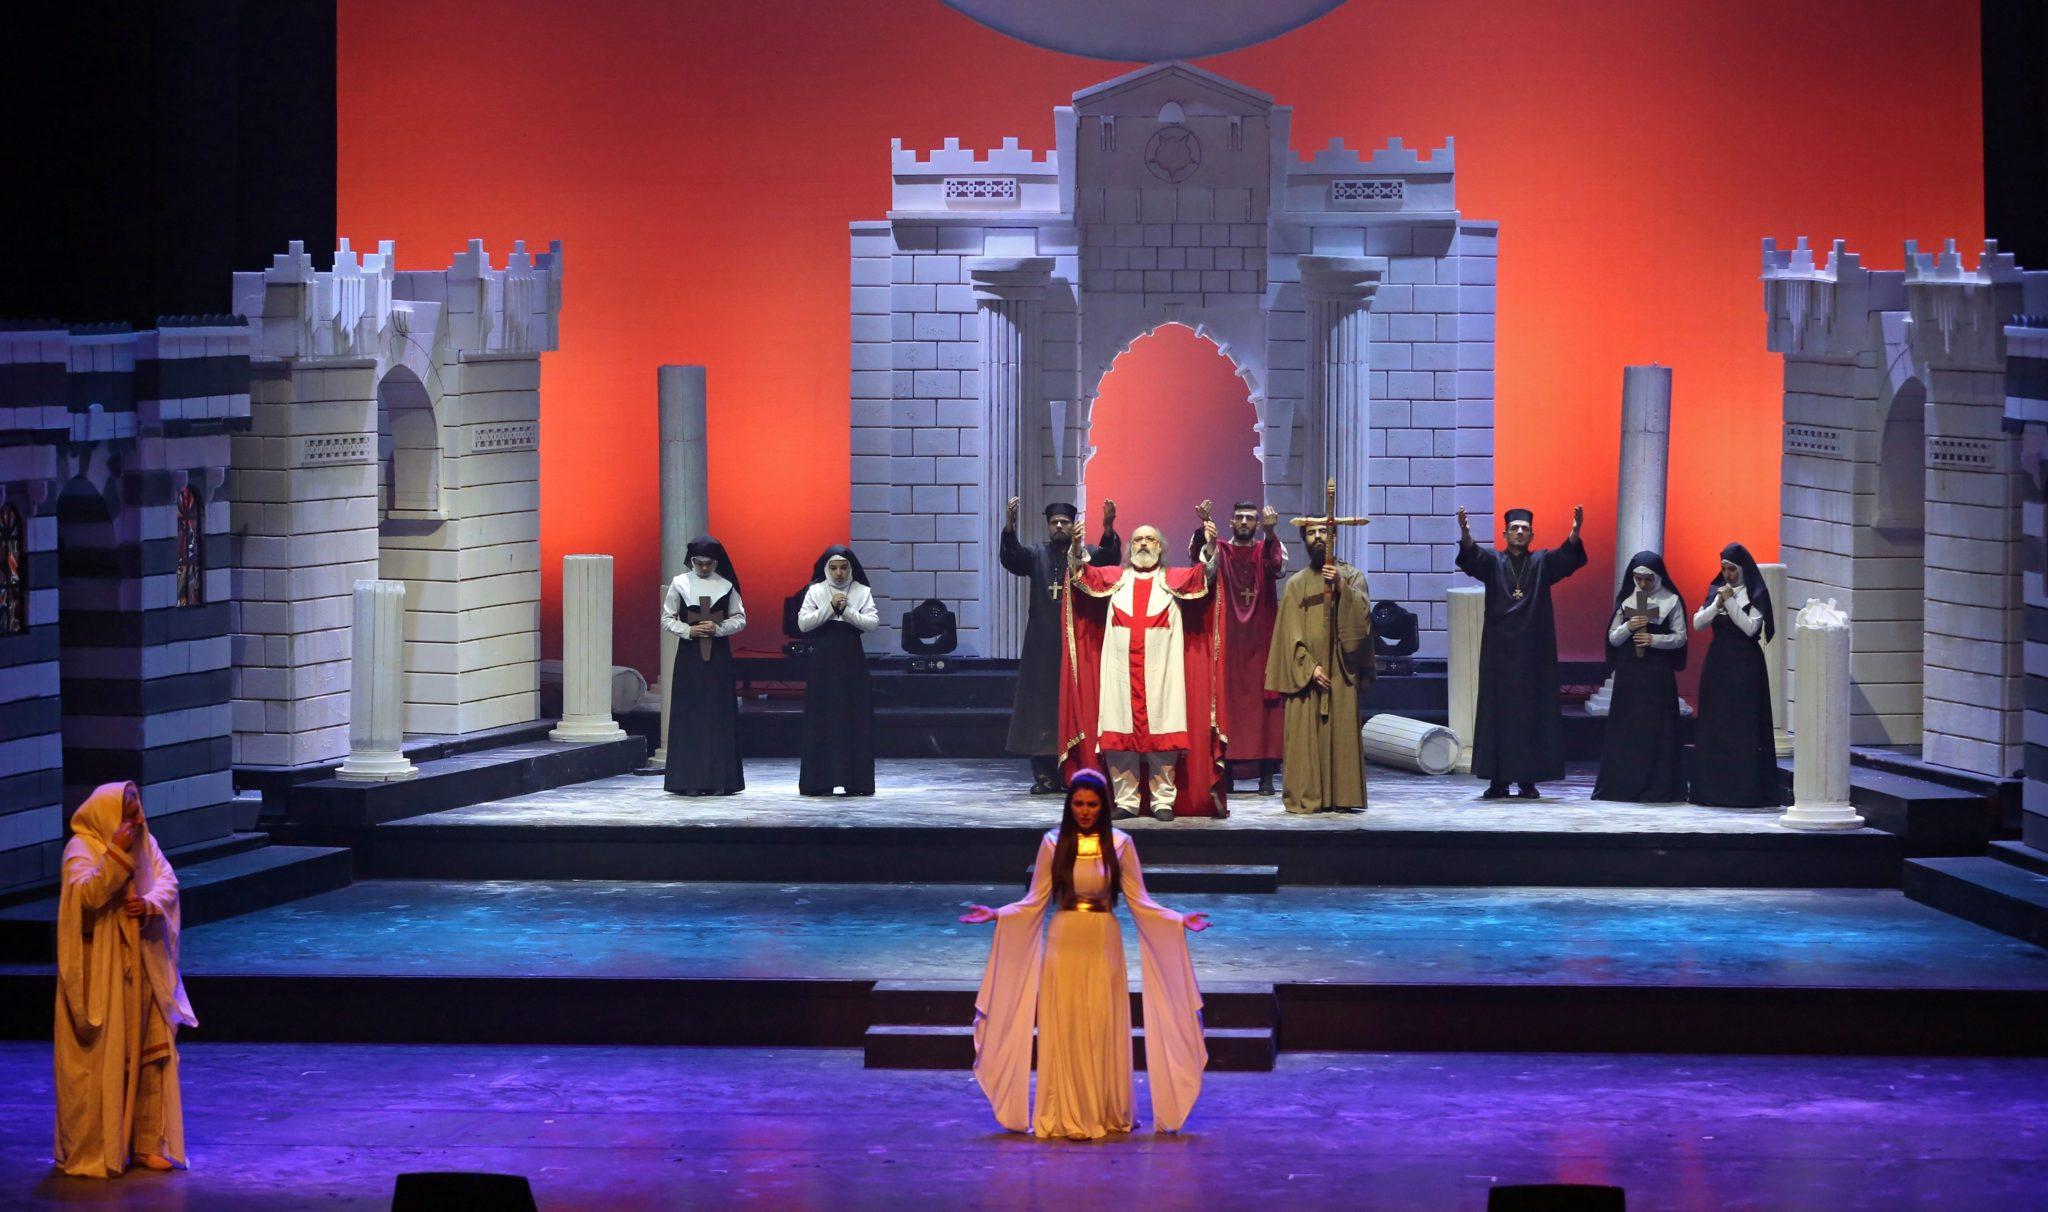 Opera zatytułowana